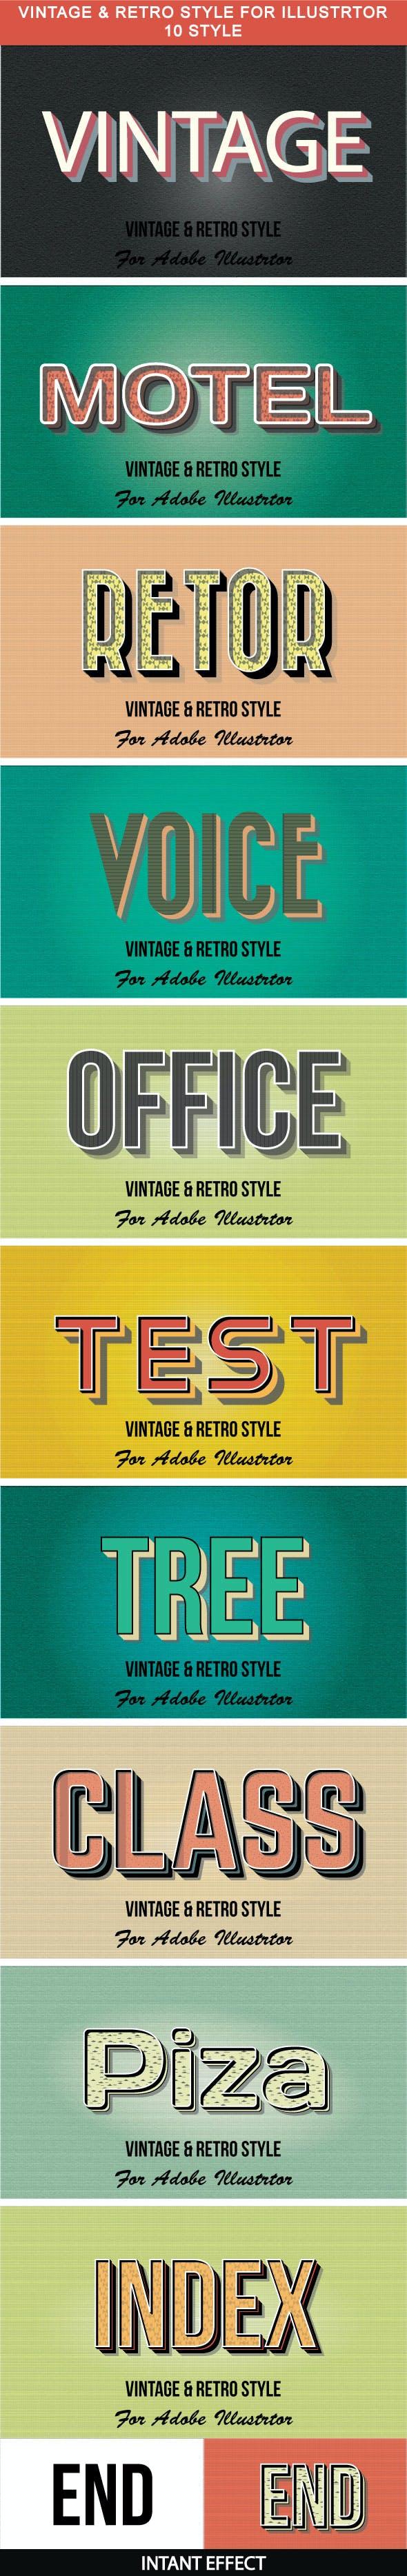 10_Vintage & Retro Style